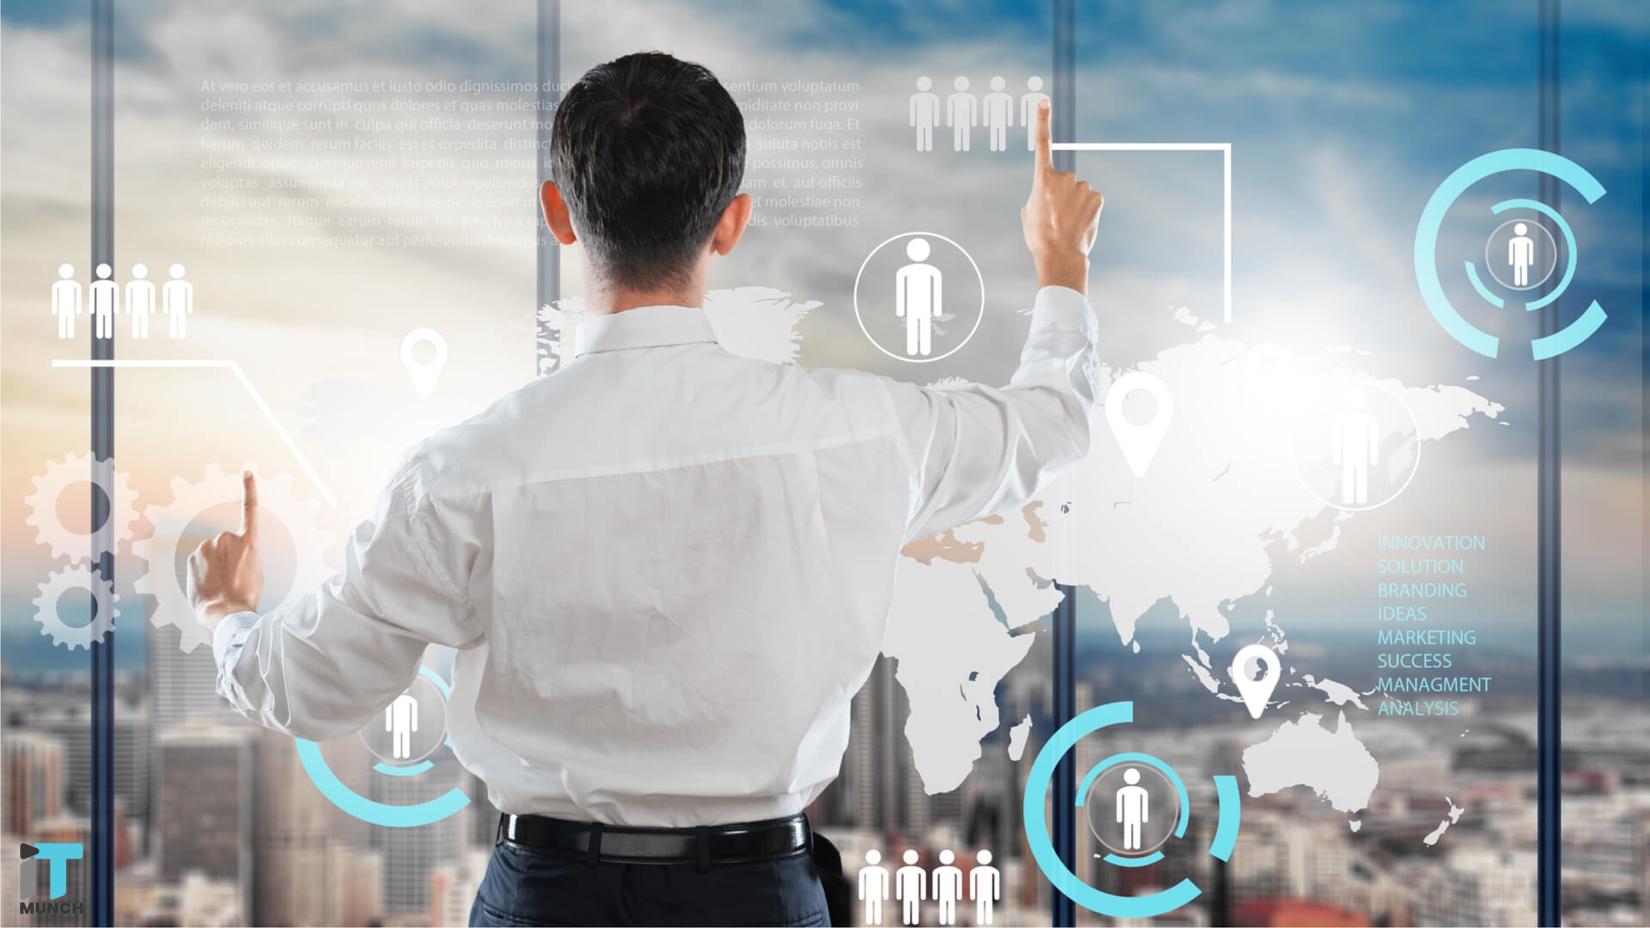 Impact of technology on business intelligence | iTMunch